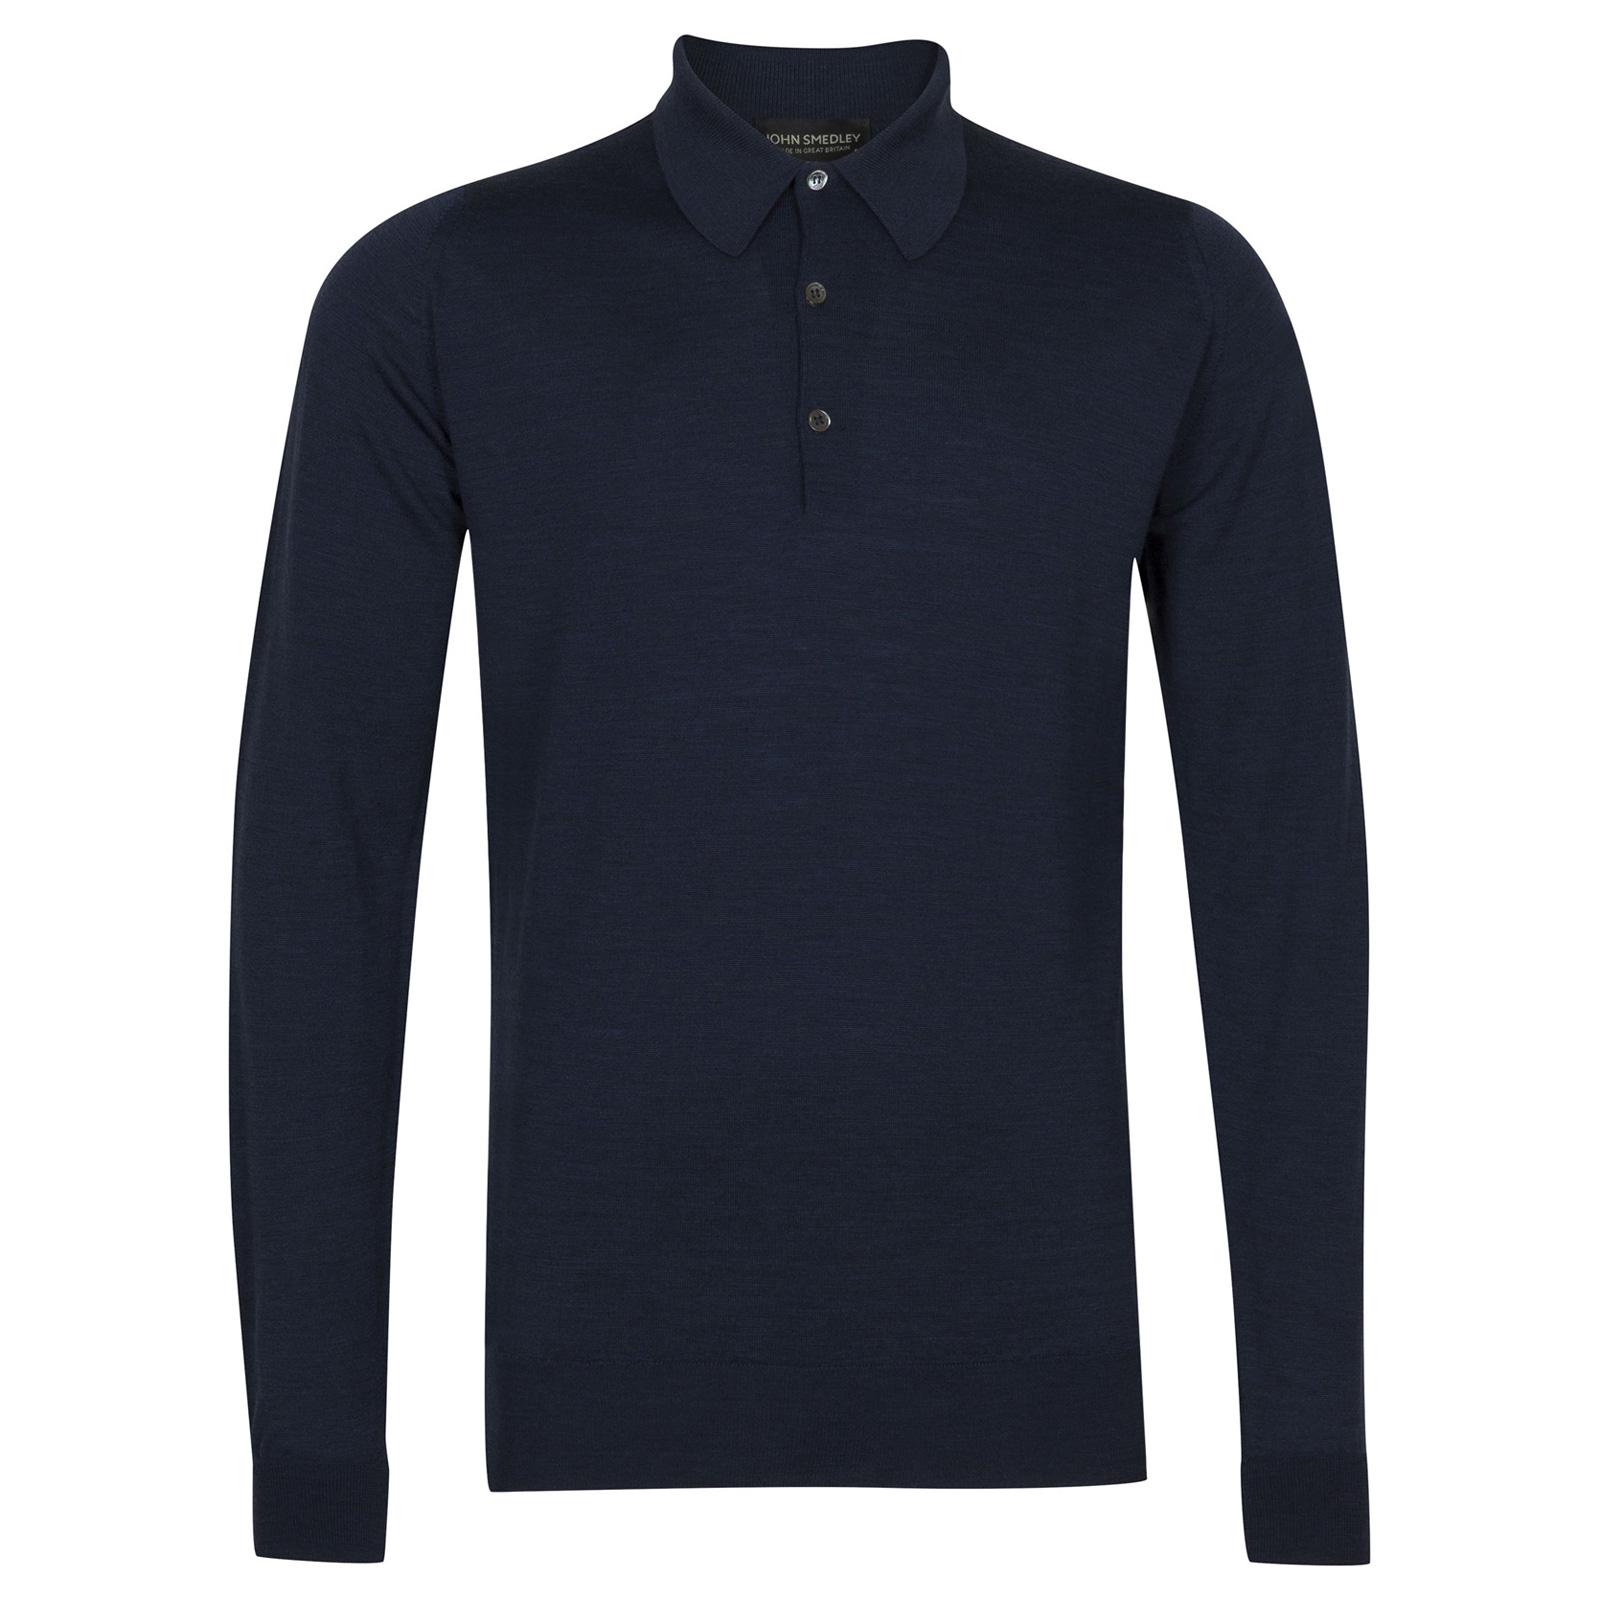 John Smedley dorset Merino Wool Shirt in Indigo-S